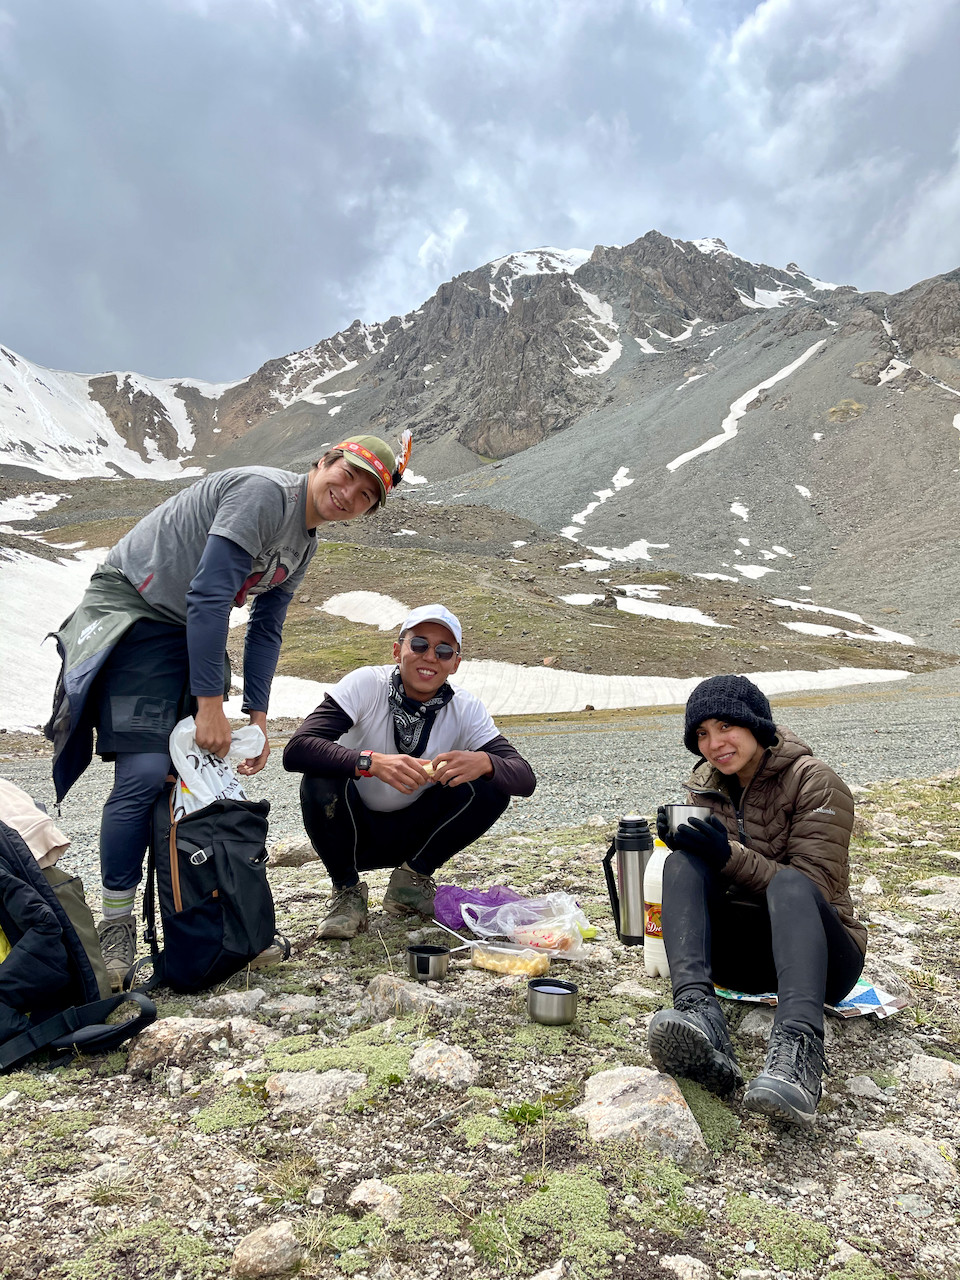 Ala Kul Kyrgyzstan Hike Travel